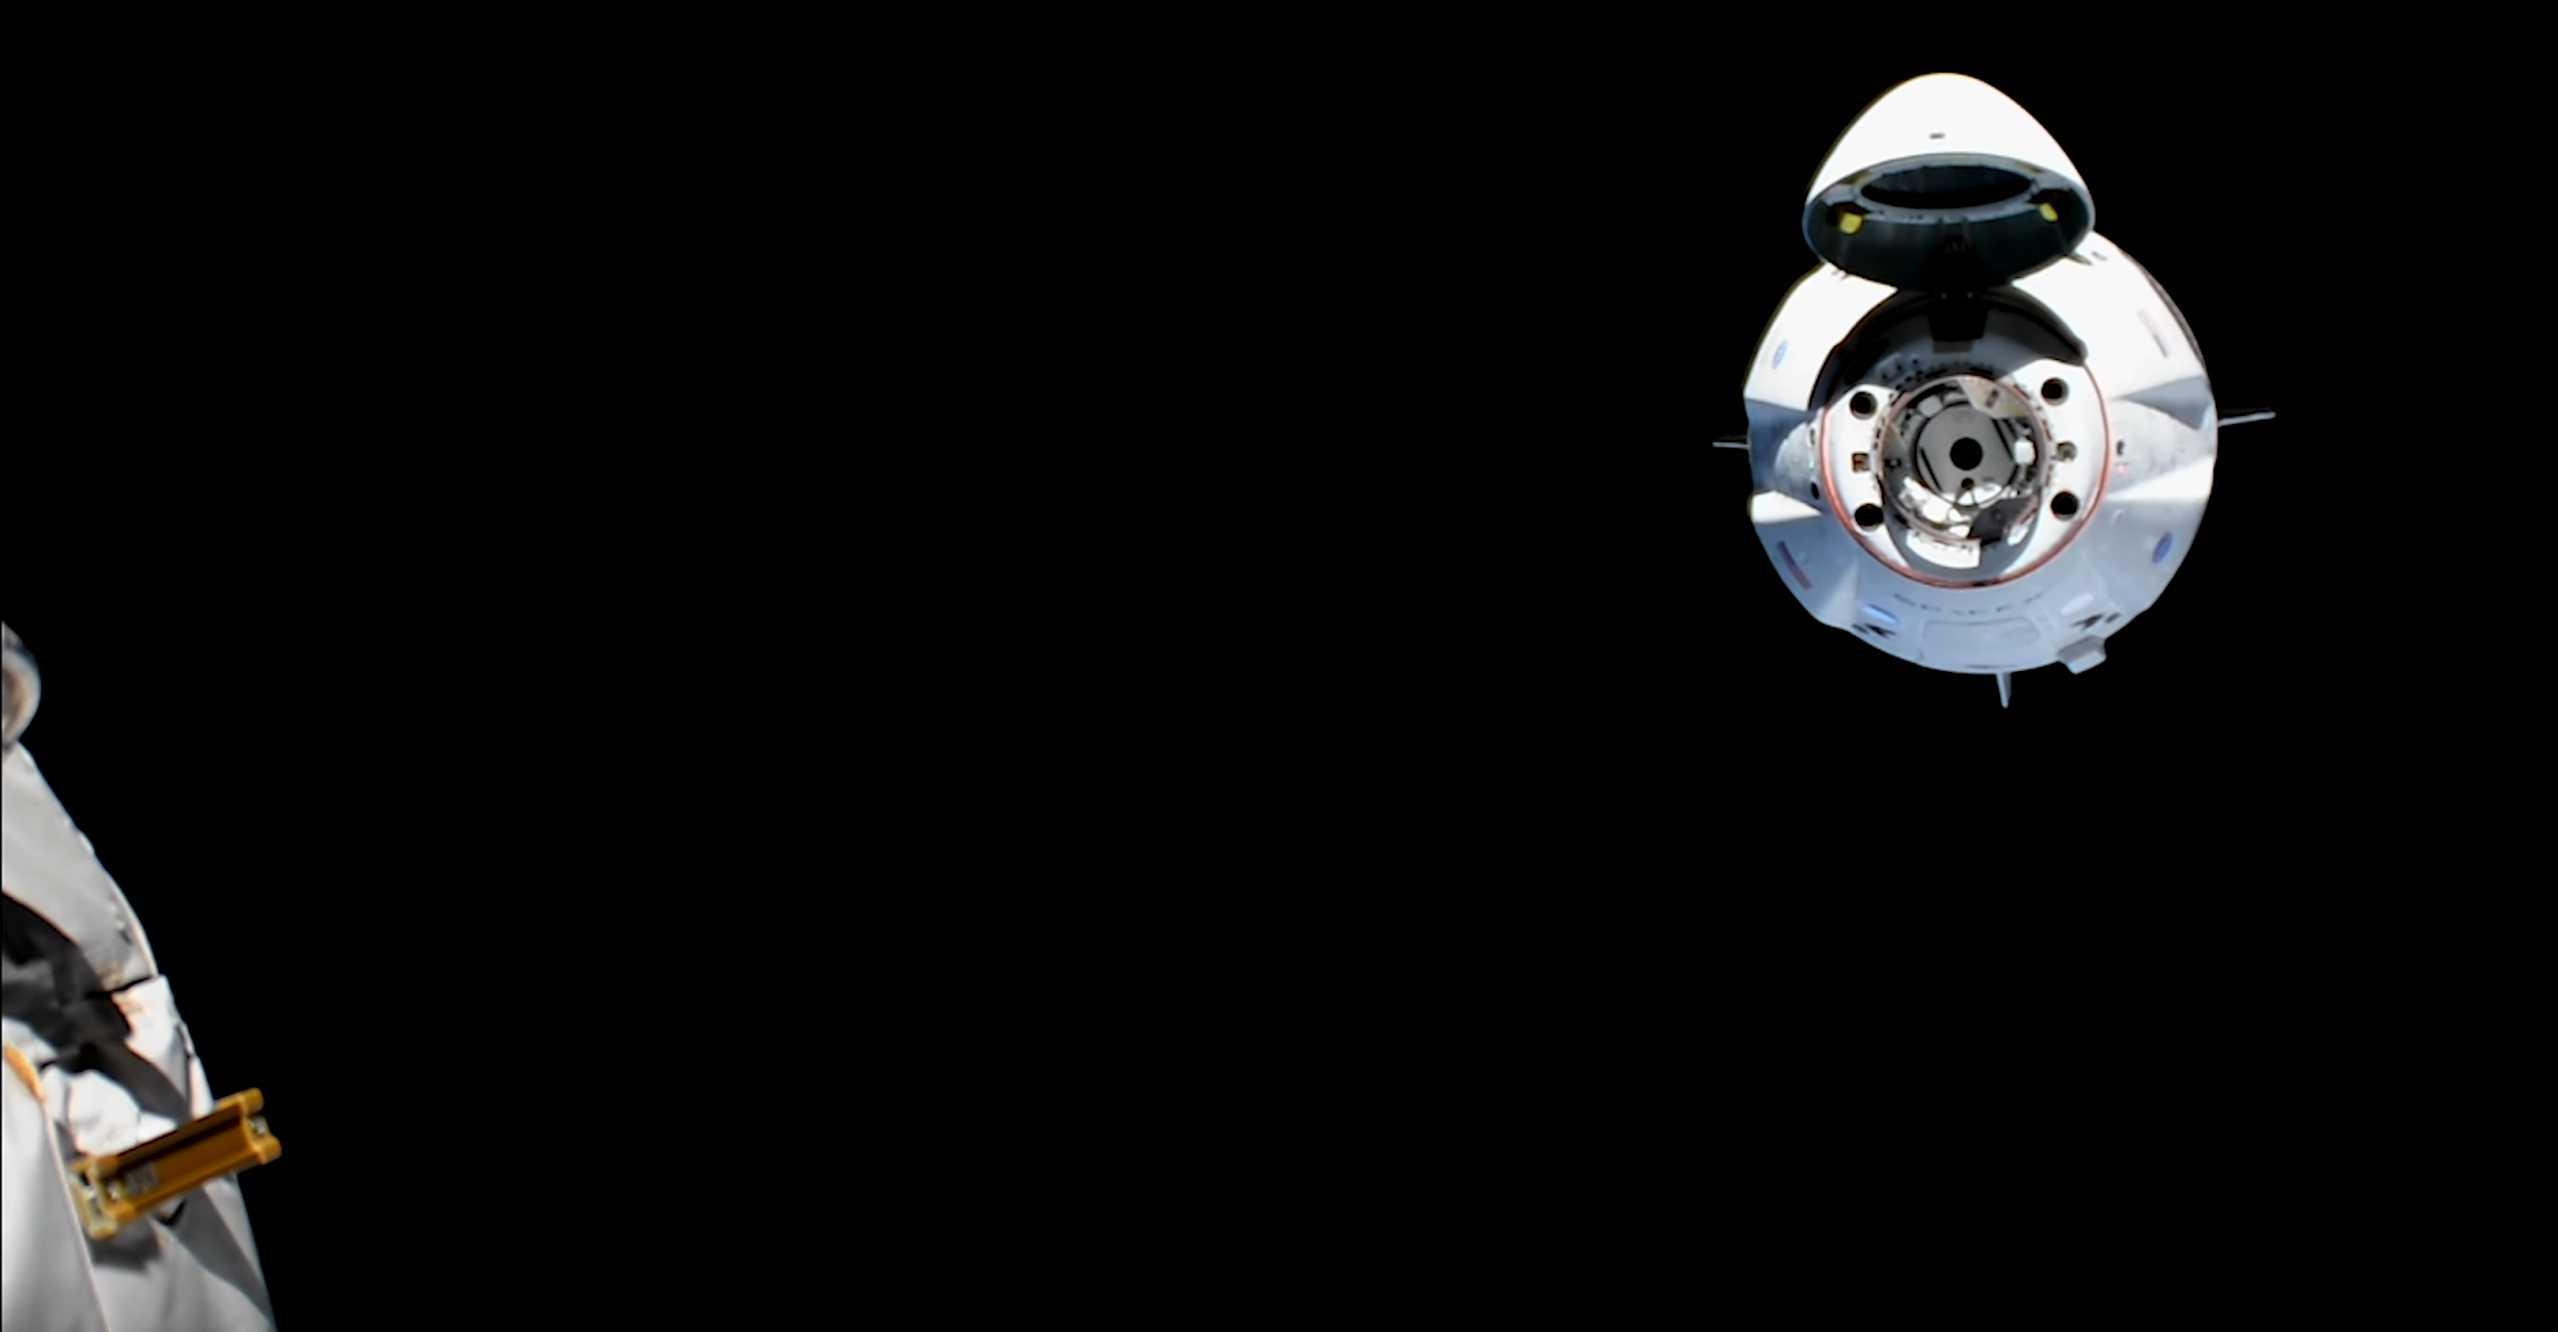 Crew Dragon C201 Demo-1 anniversary (SpaceX) video 5 (c)